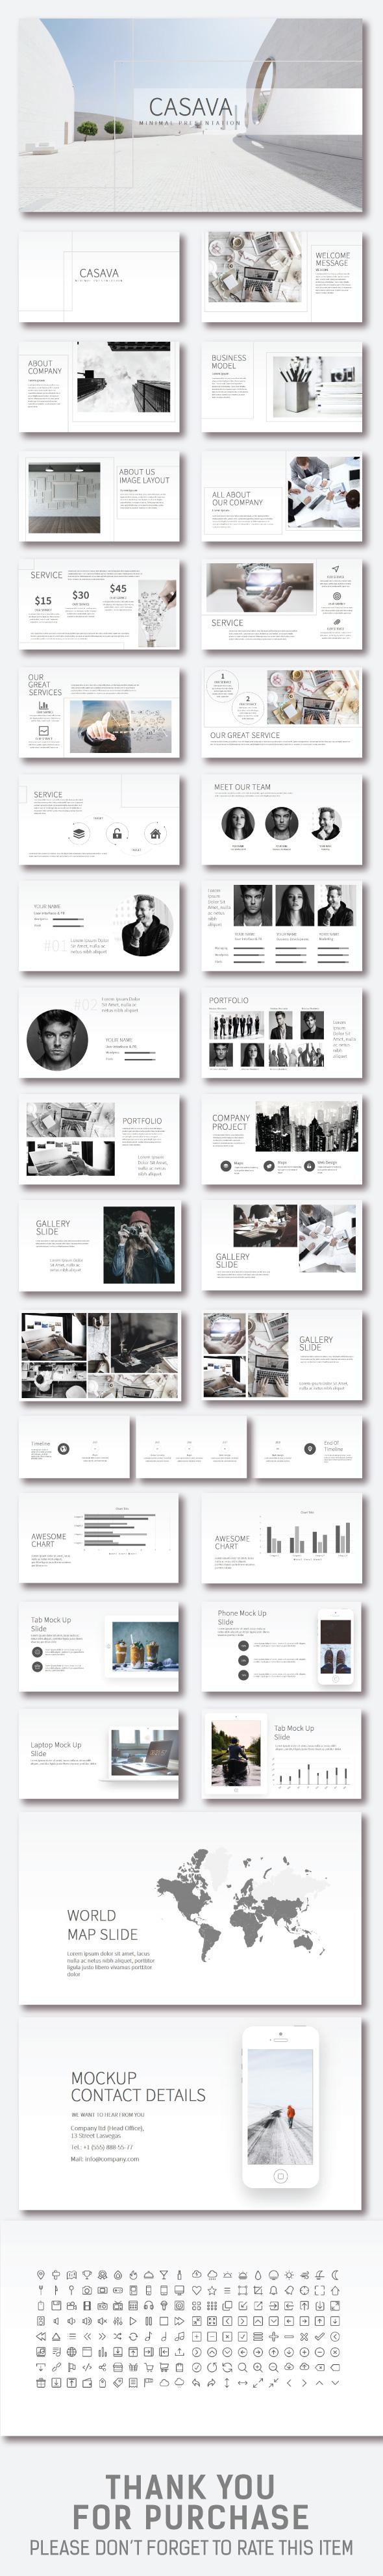 Casava Minimal Presentation - Business PowerPoint Templates